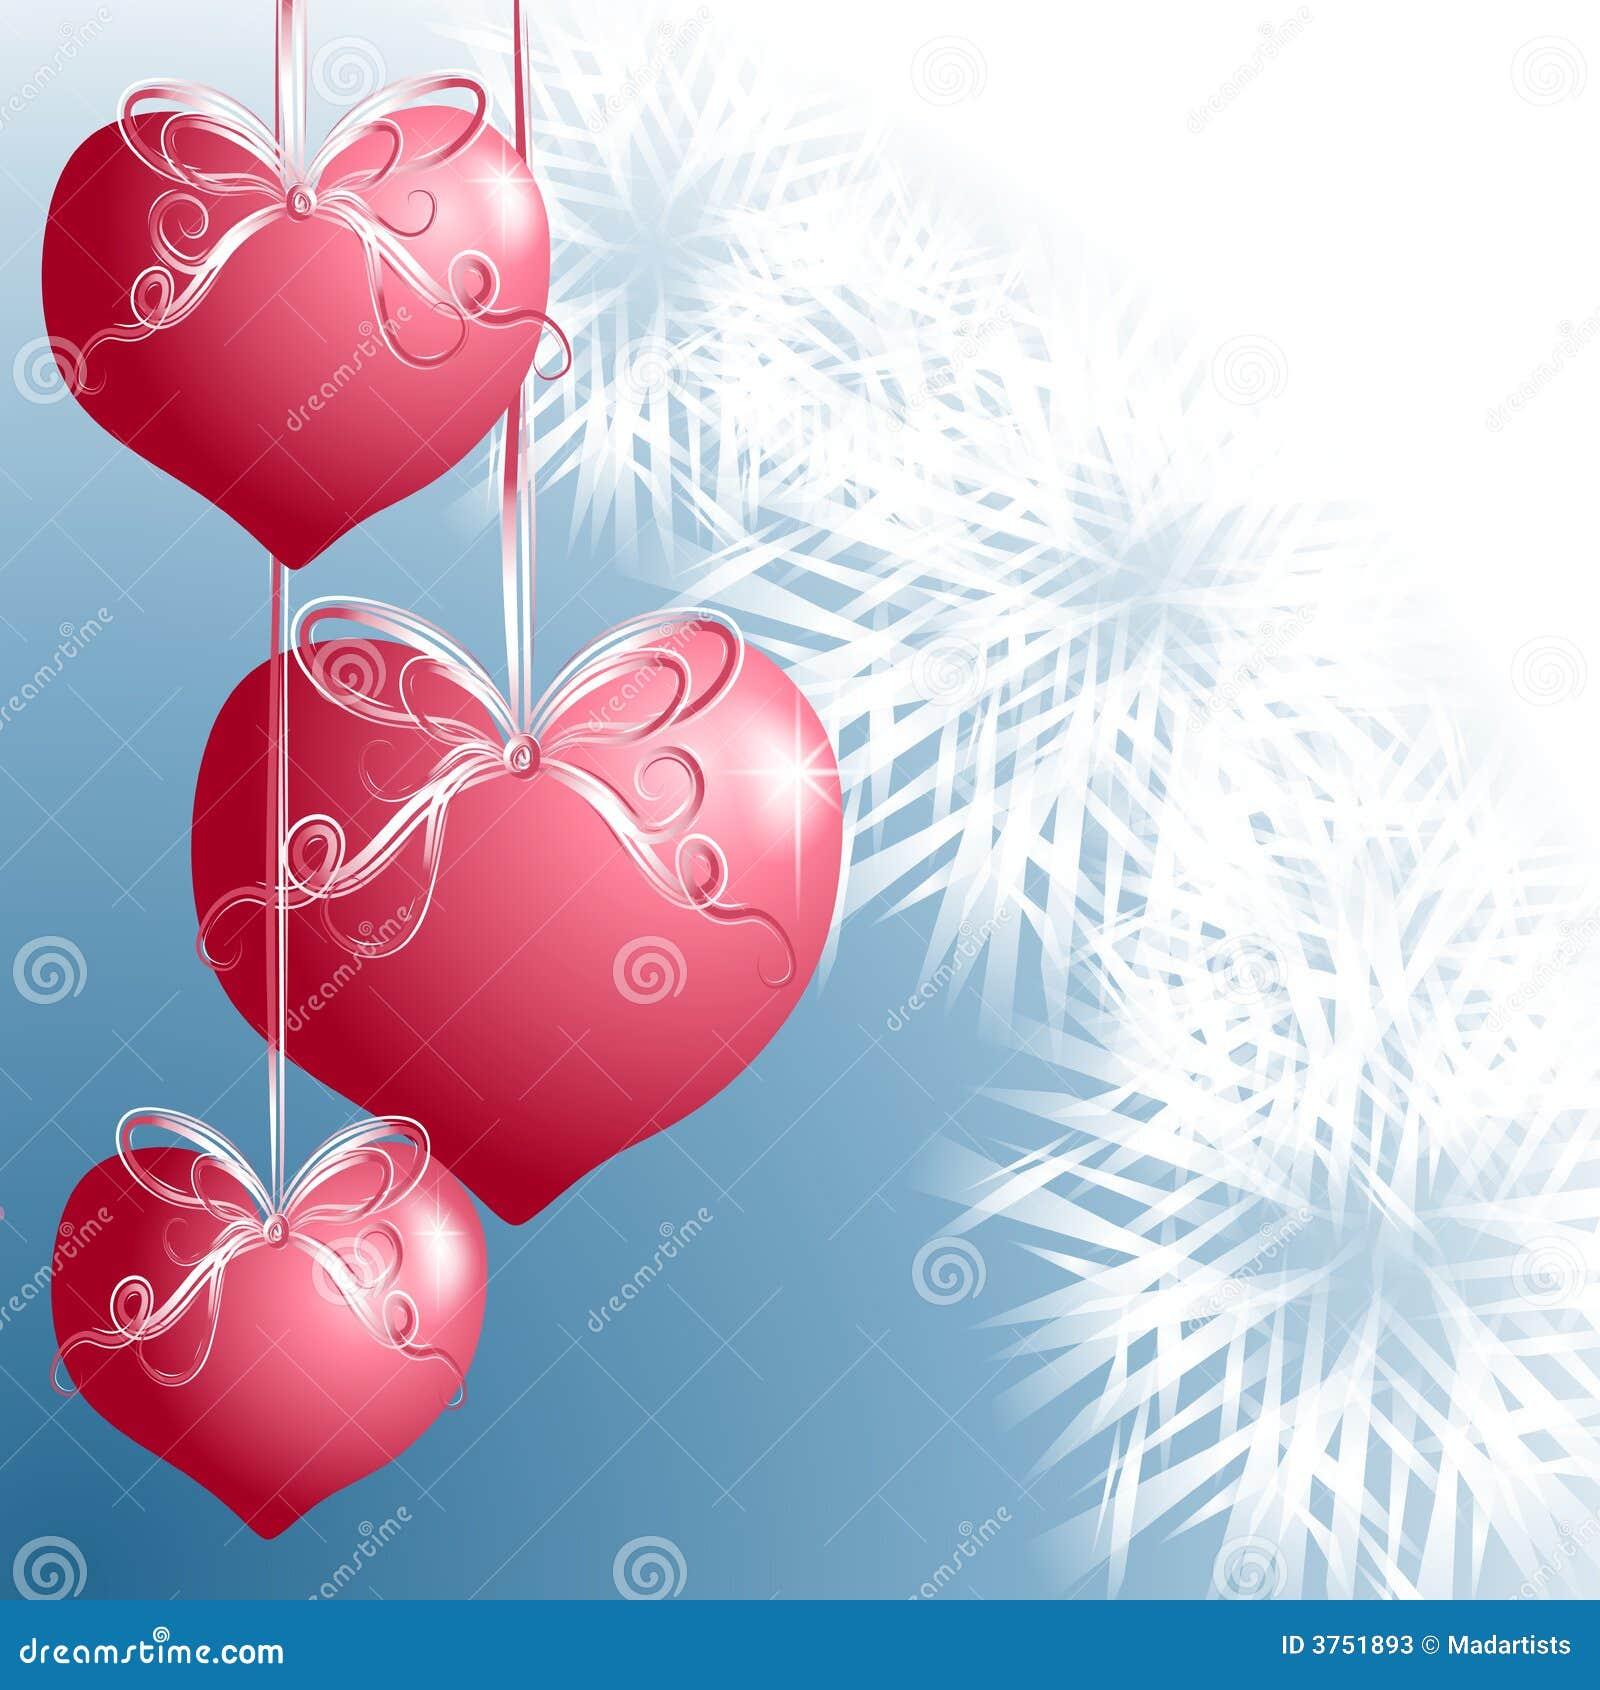 heart shaped christmas ornaments stock illustration illustration